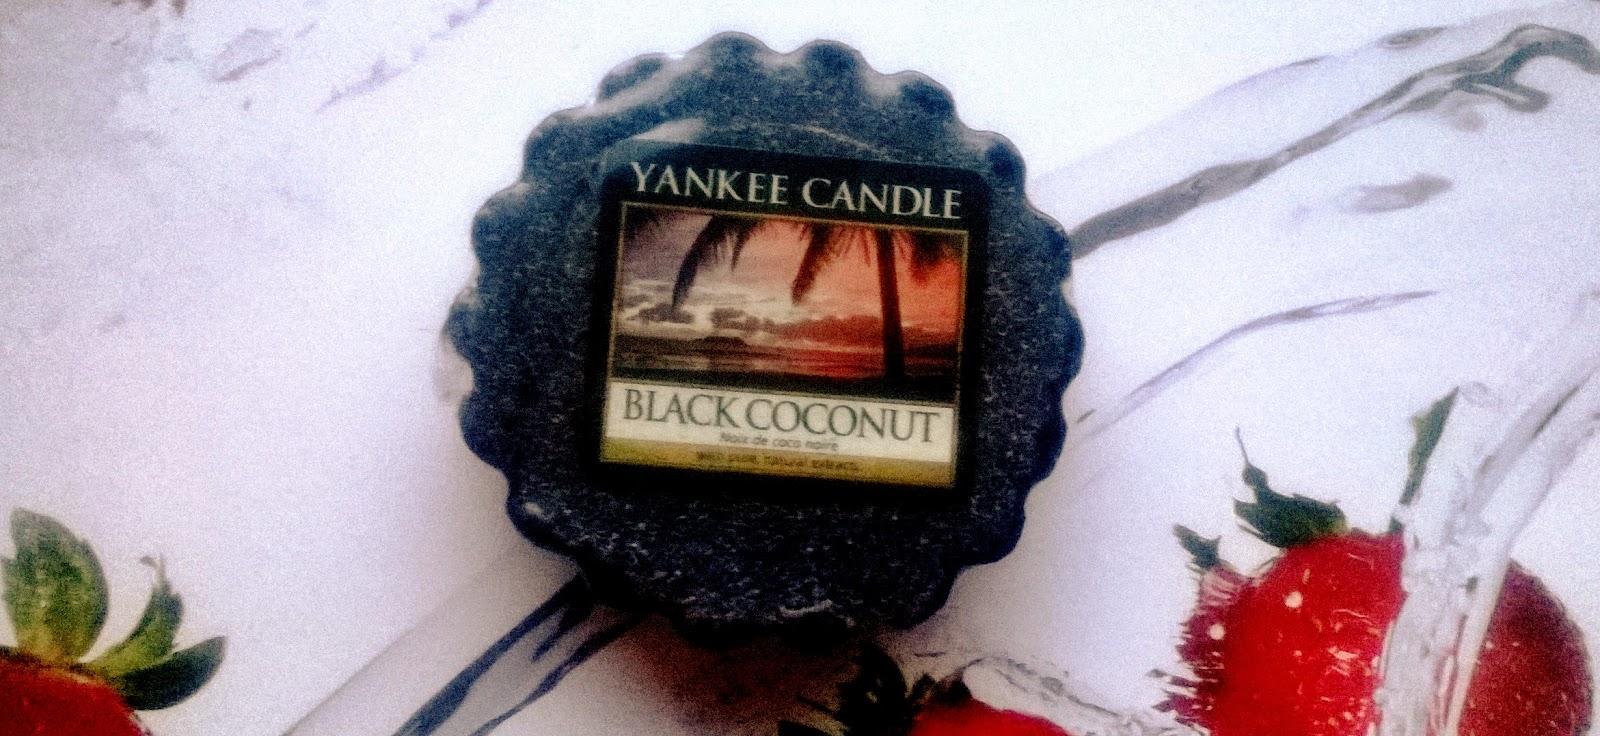 [Yankee Candle] Czarny kokos